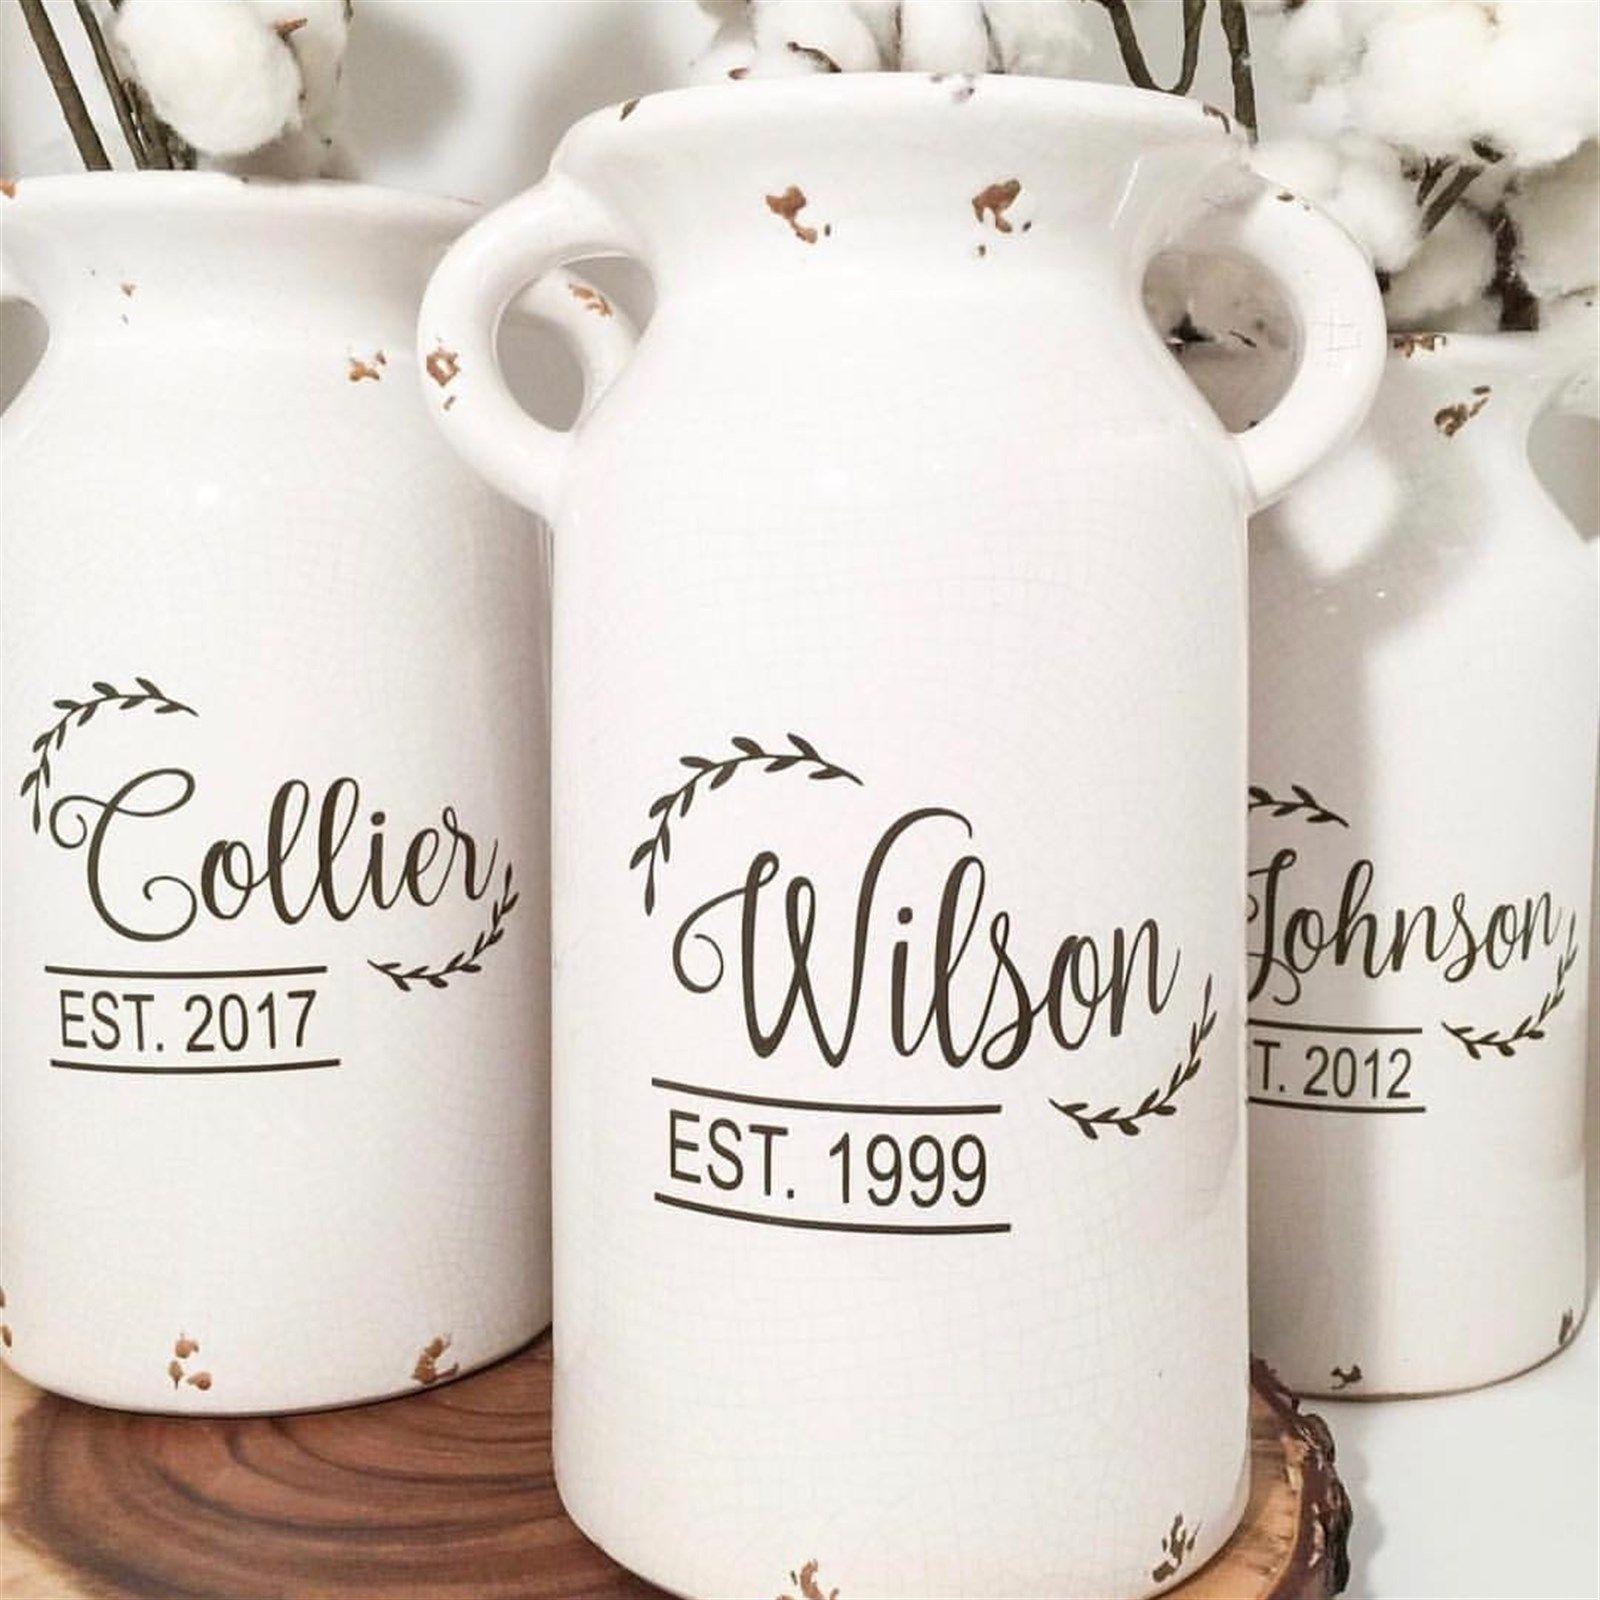 Personalized Ceramic Milk Jug Milk jug, Milk cans